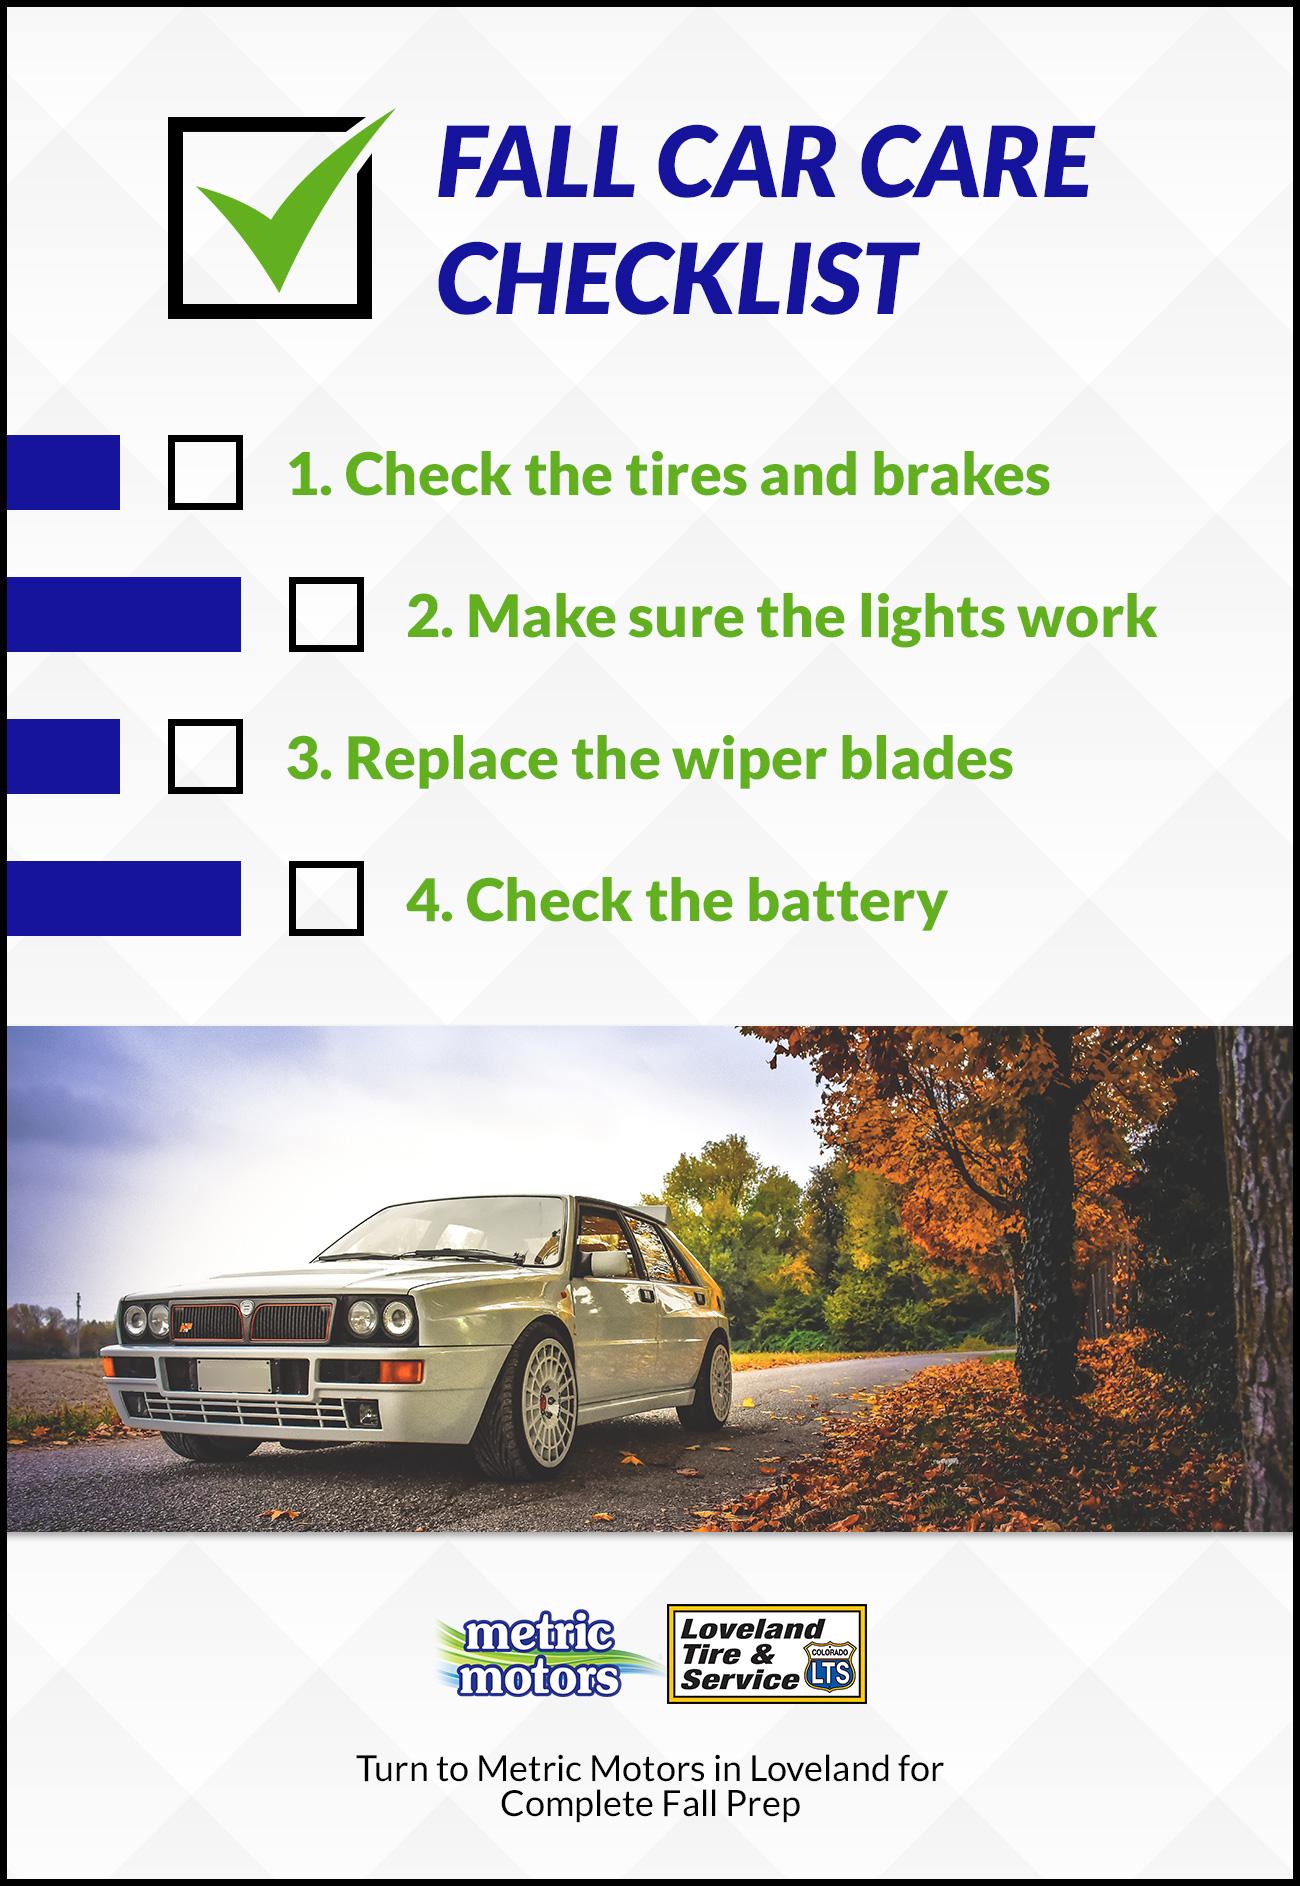 Auto Mechanic Loveland: Autumn Prep Checklist